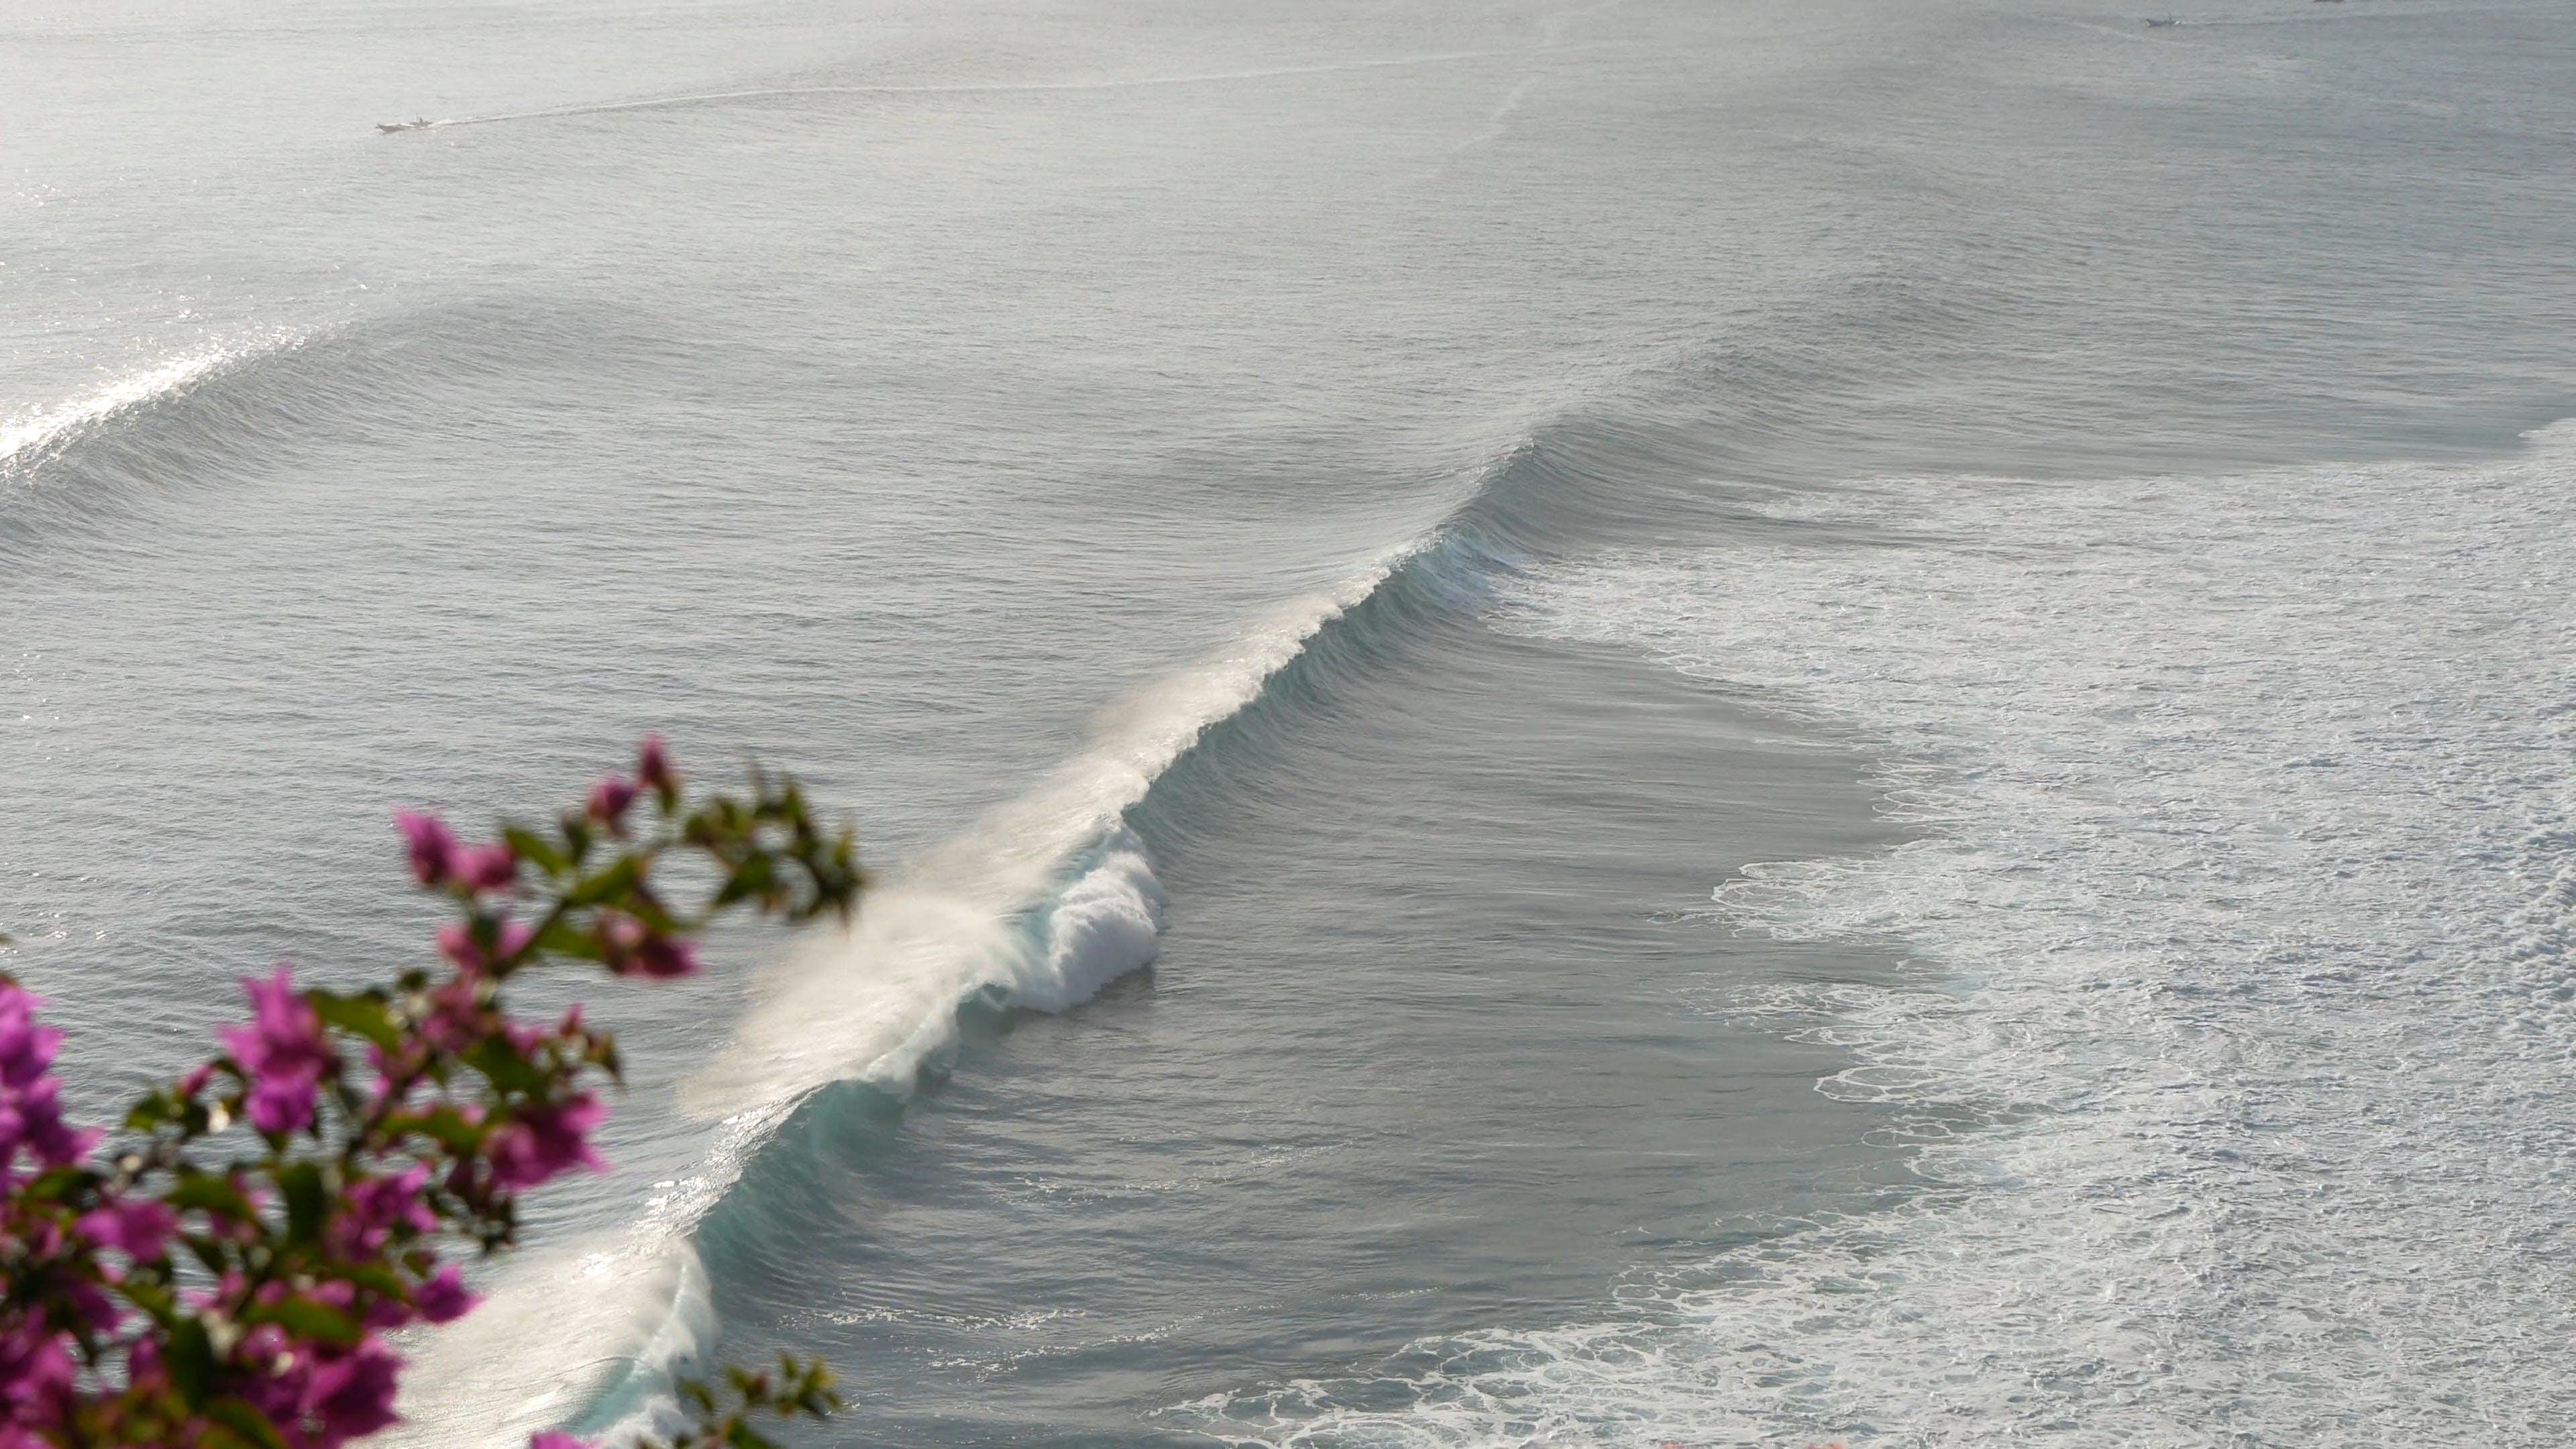 Aerial View of Big Waves